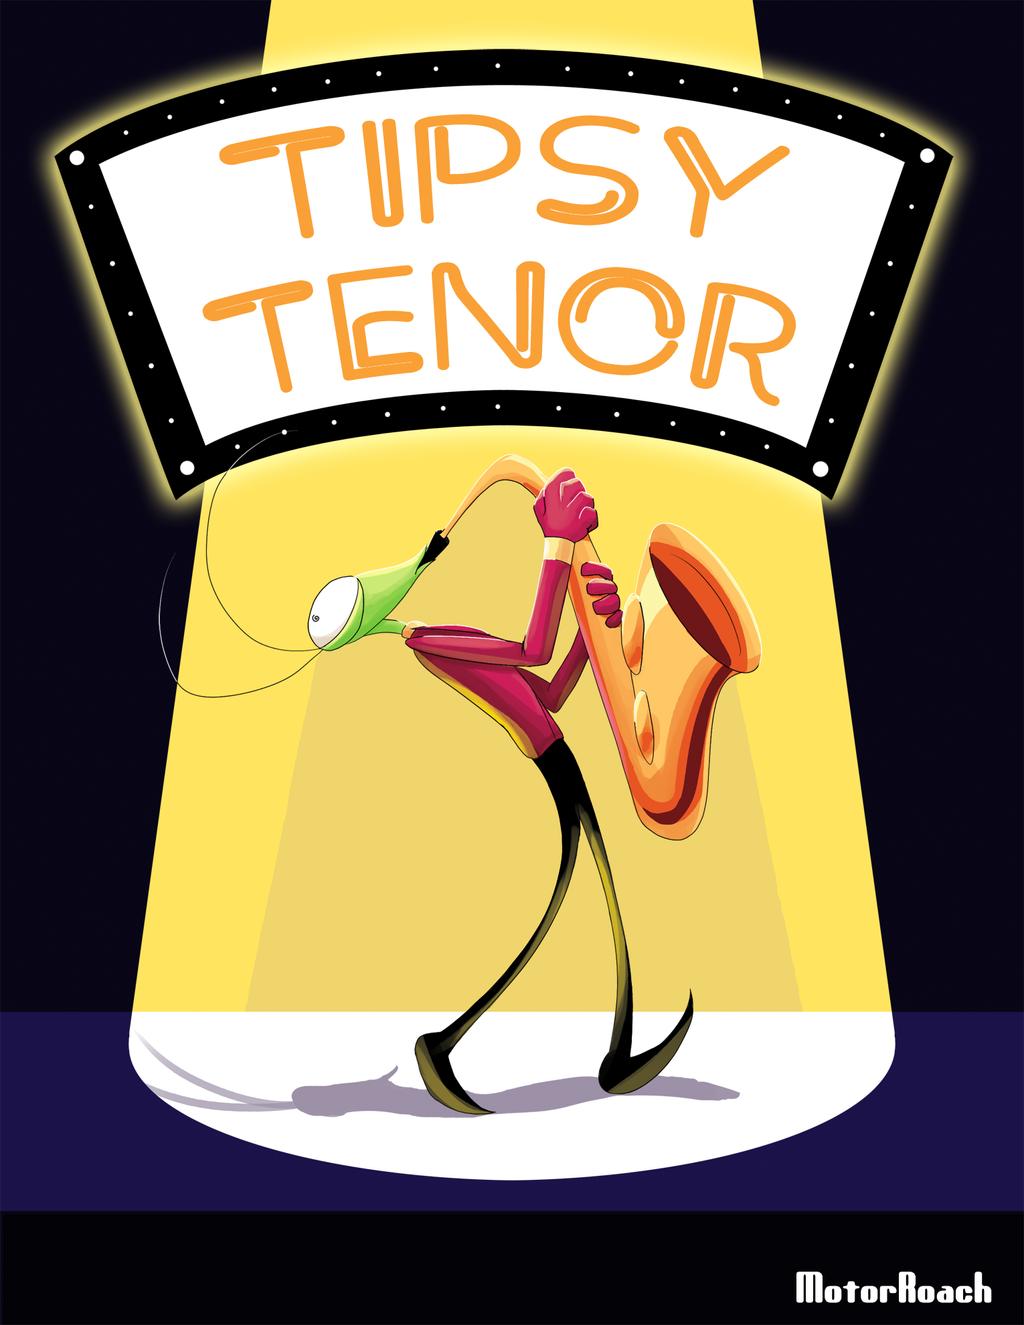 tipsy_tenor__link_in_description___by_motorroach-dc8do5b.png